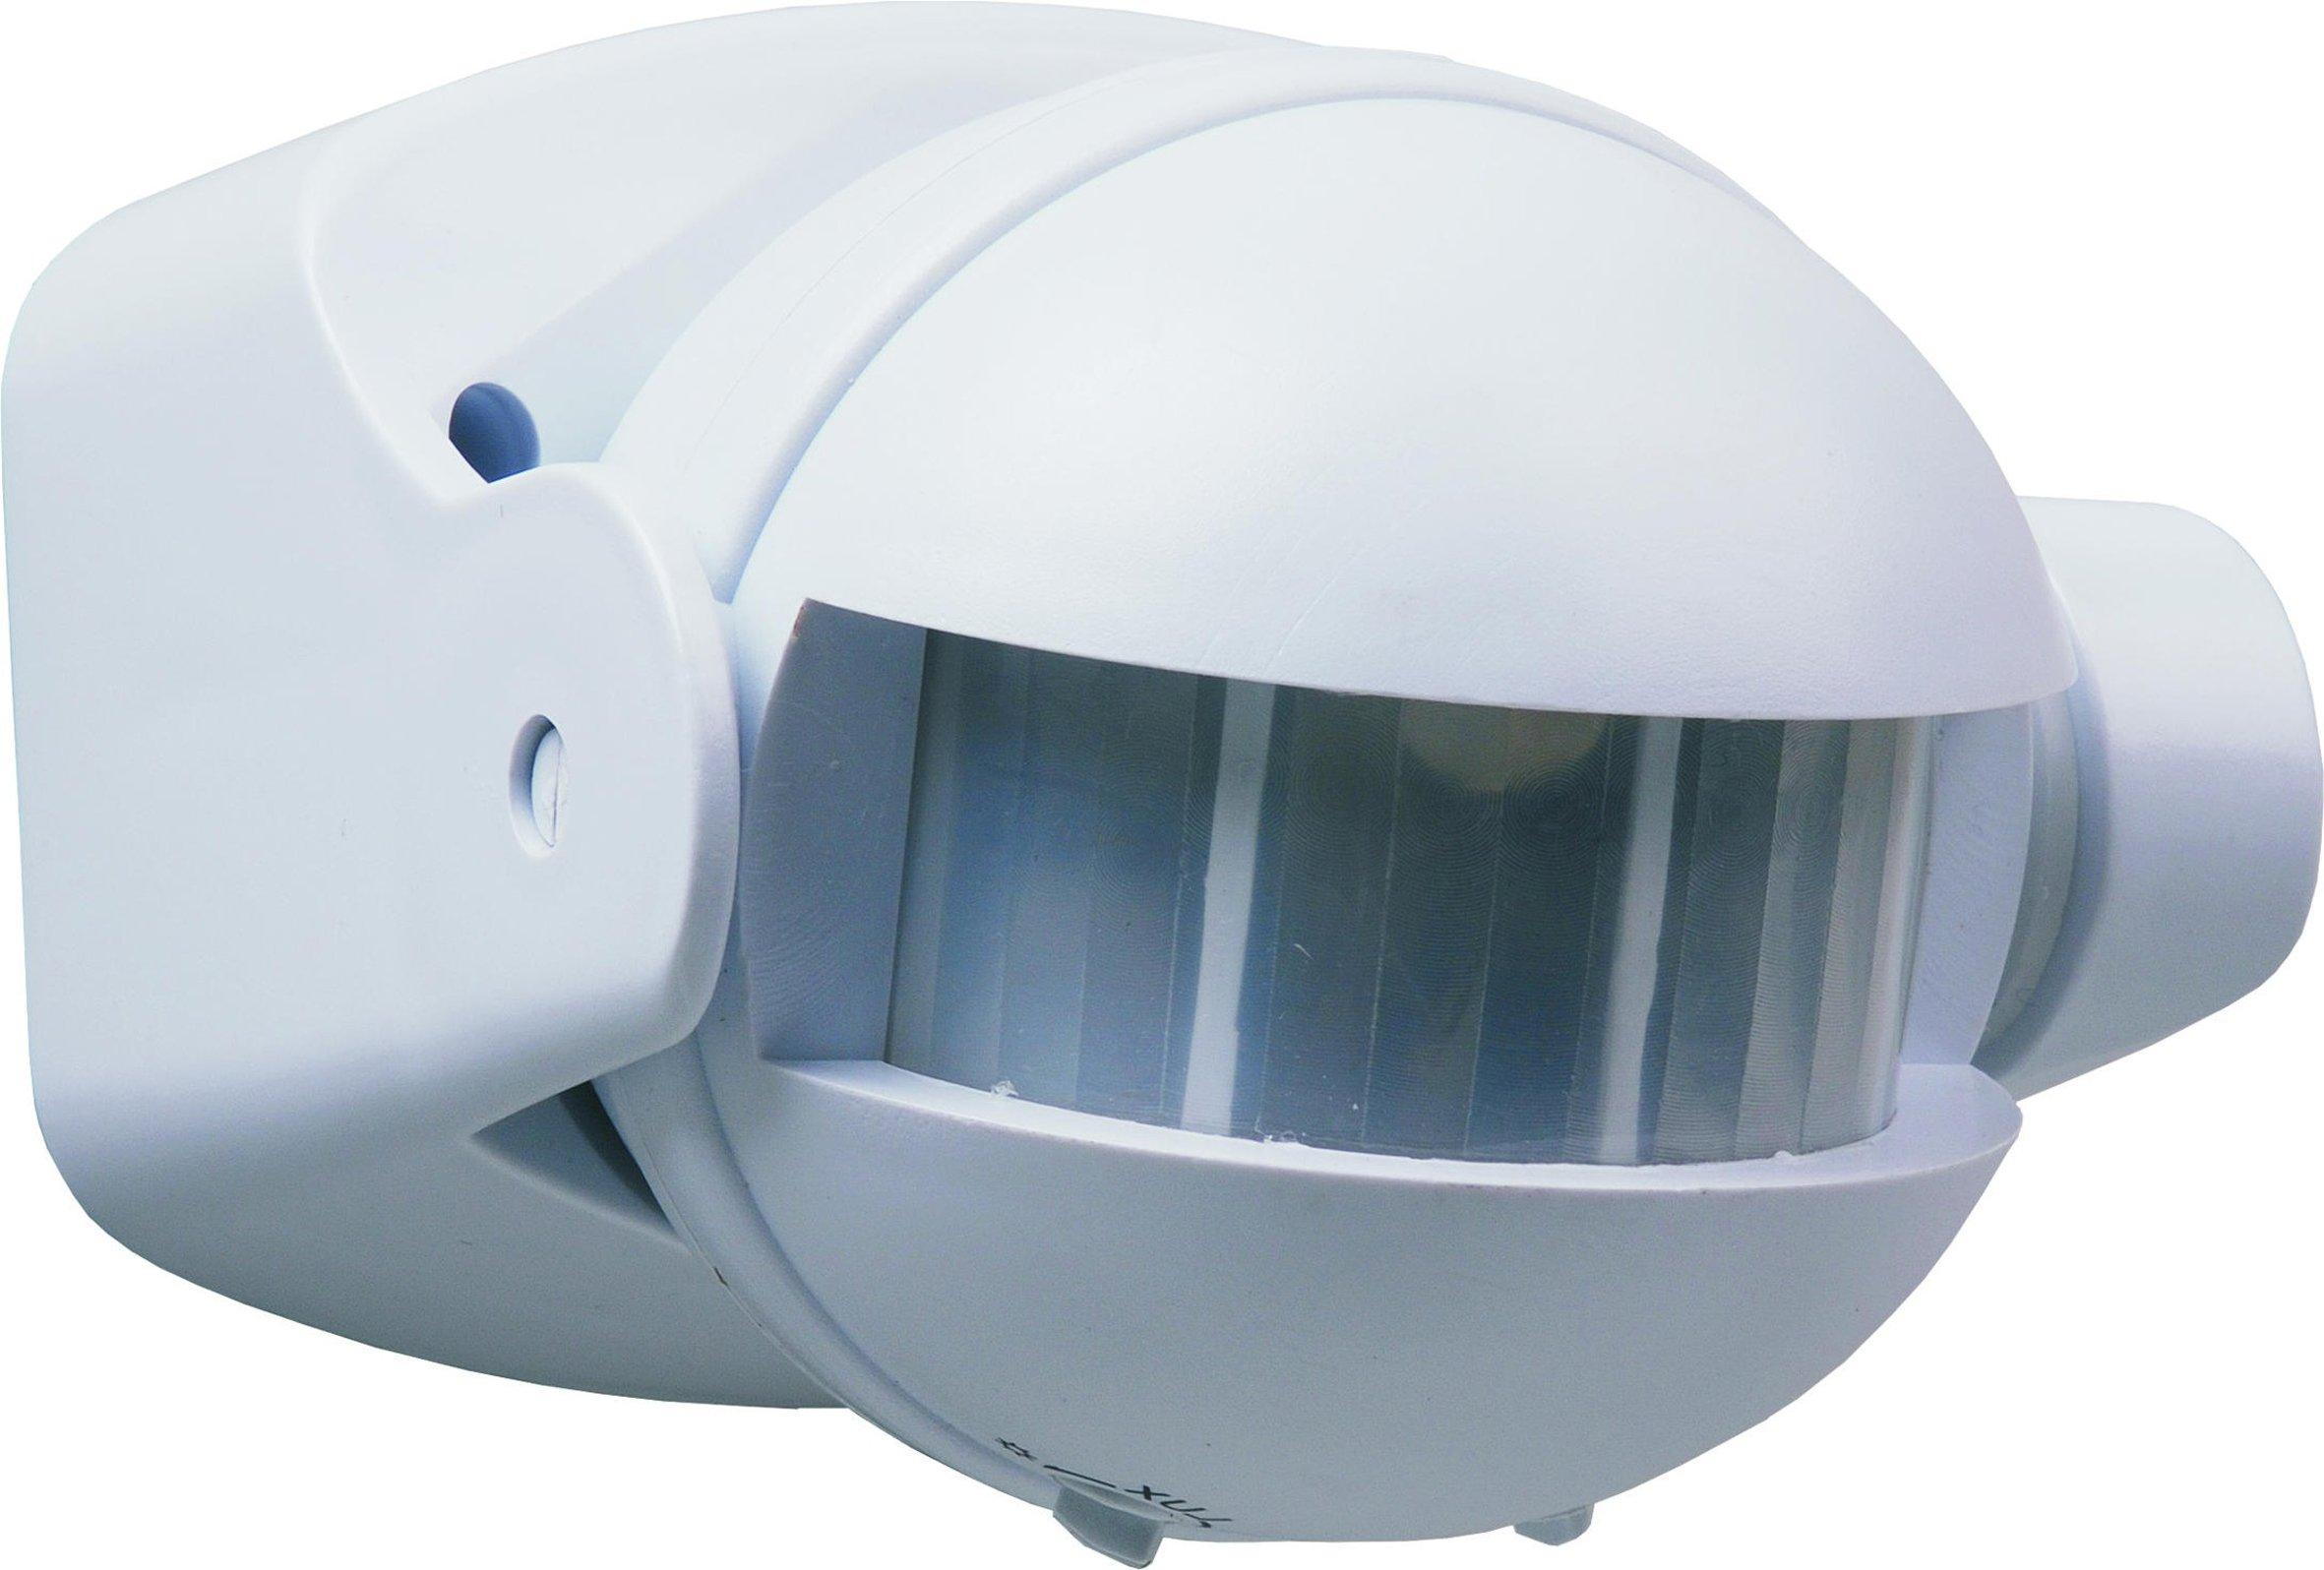 Smartwares ES34 Motion detector – 180° detection – Indoor and outdoor